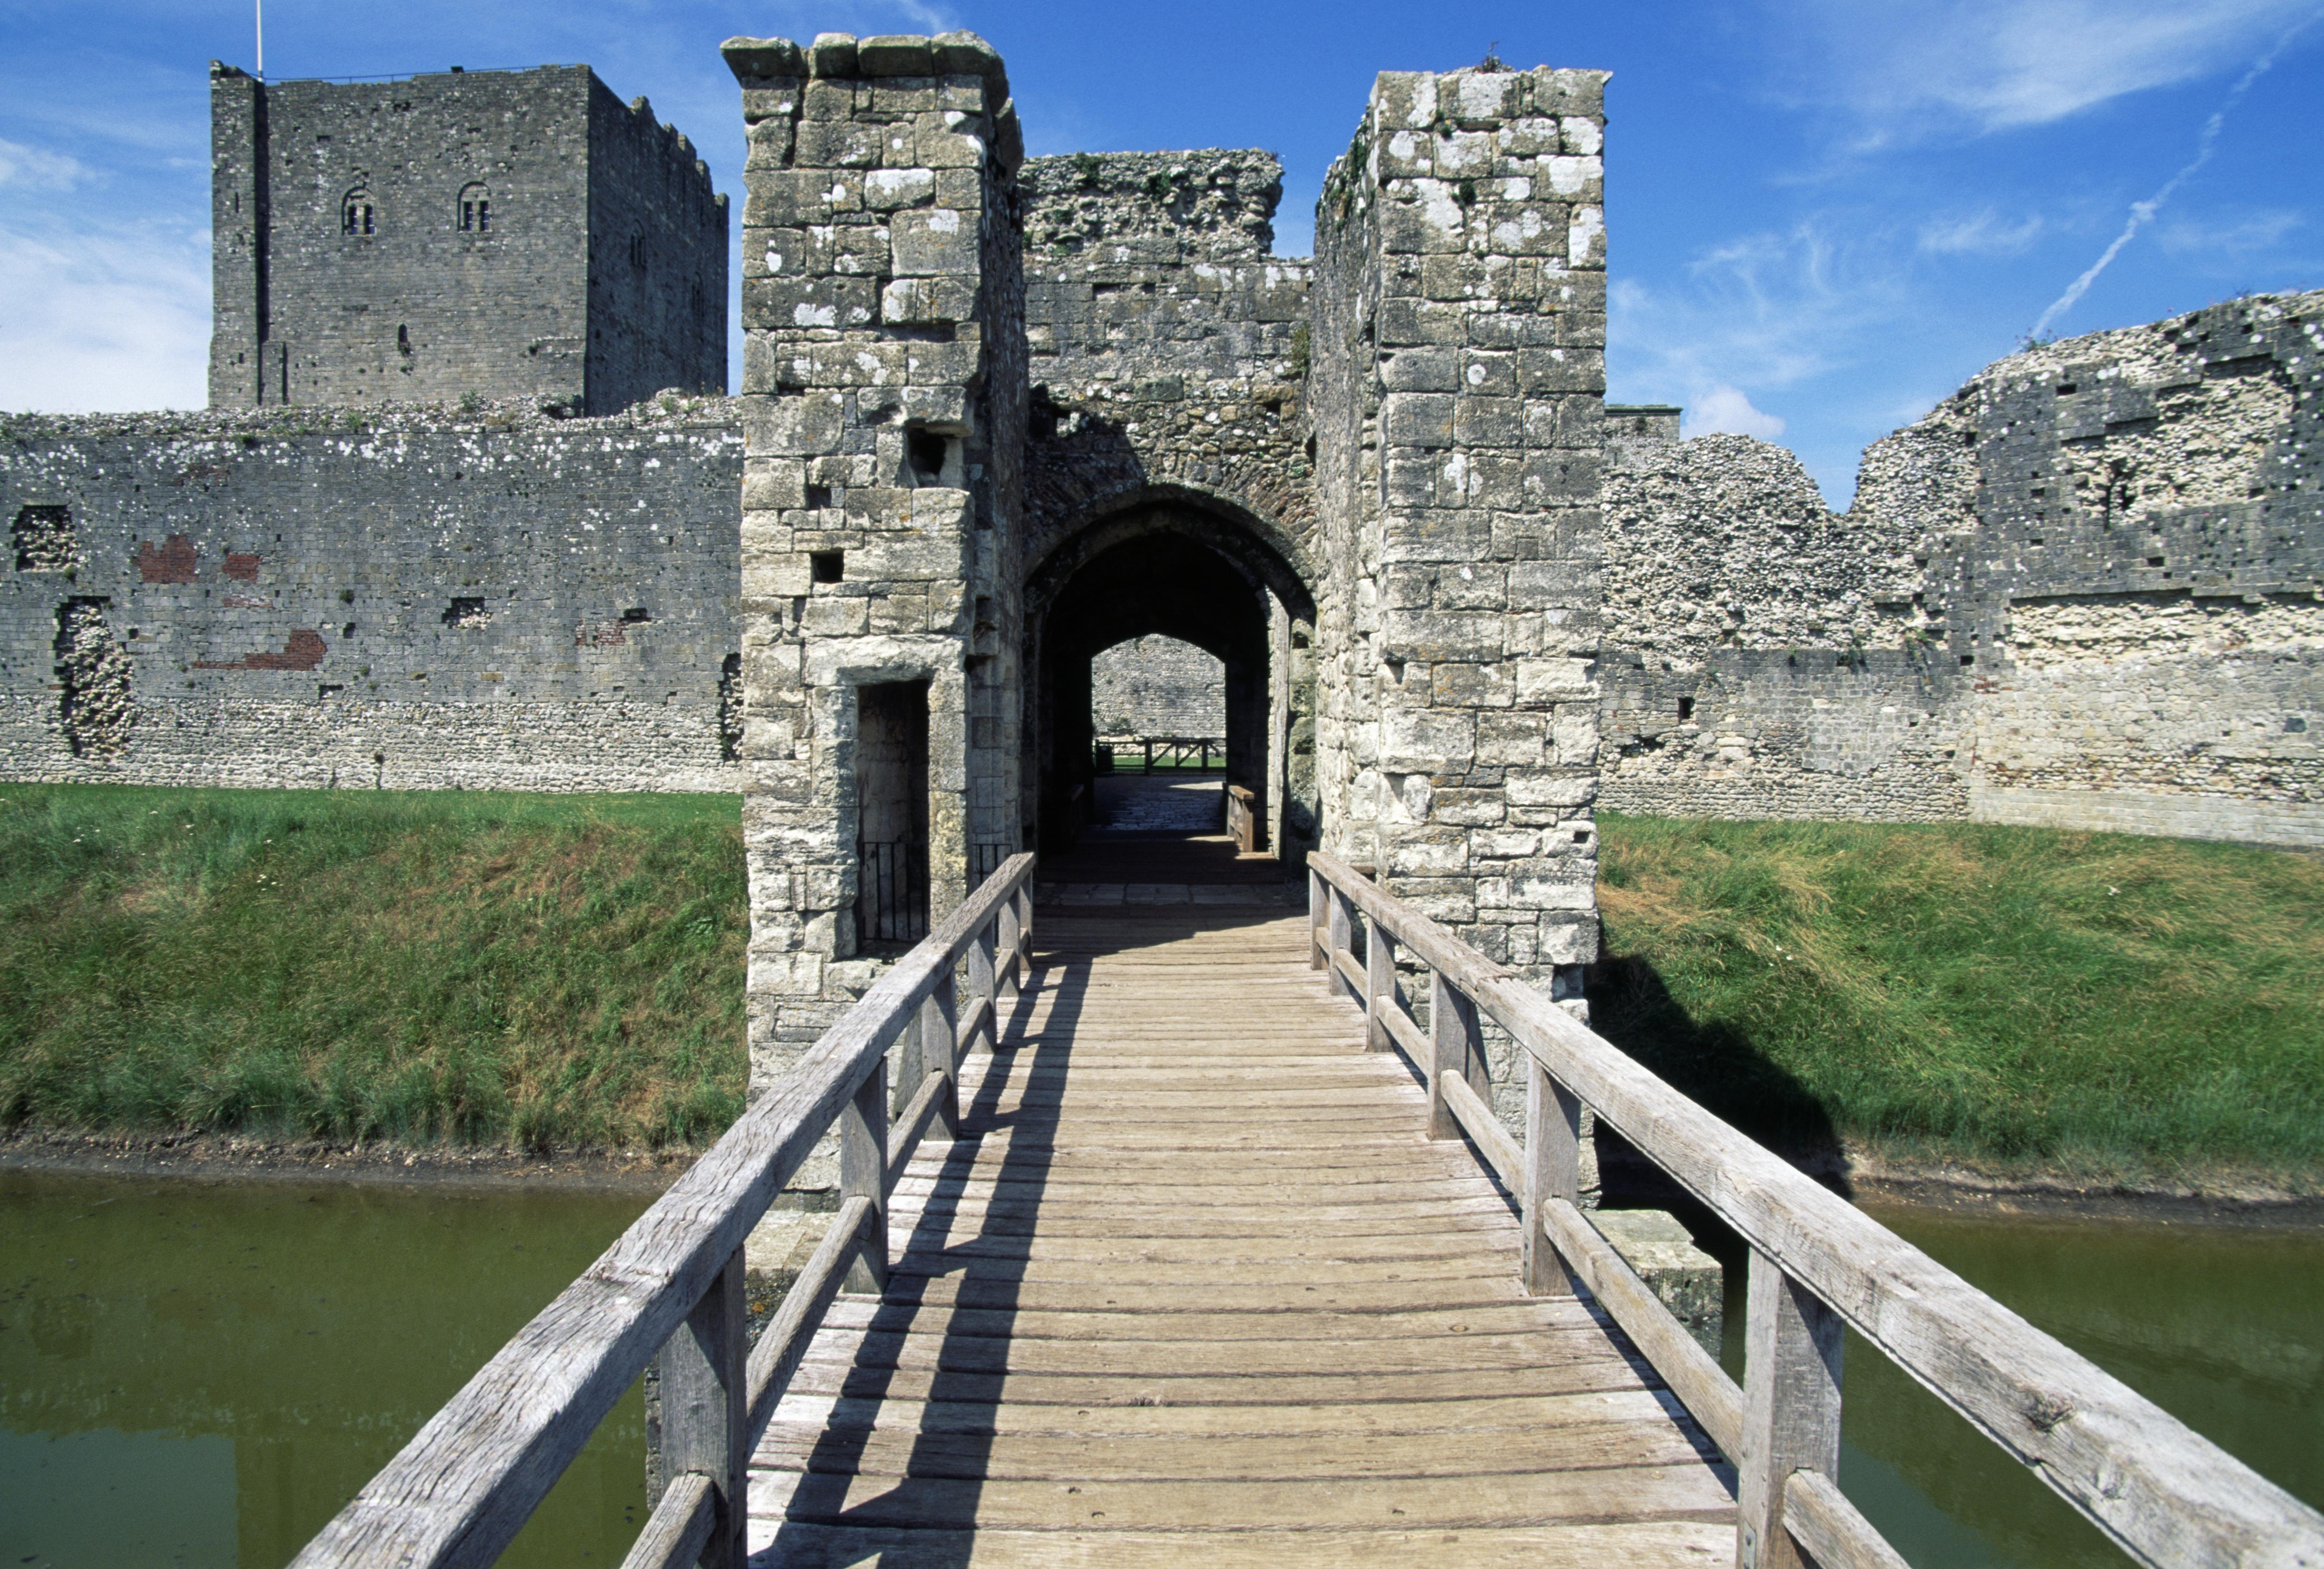 Portchester Norman Castle, Hampshire, England